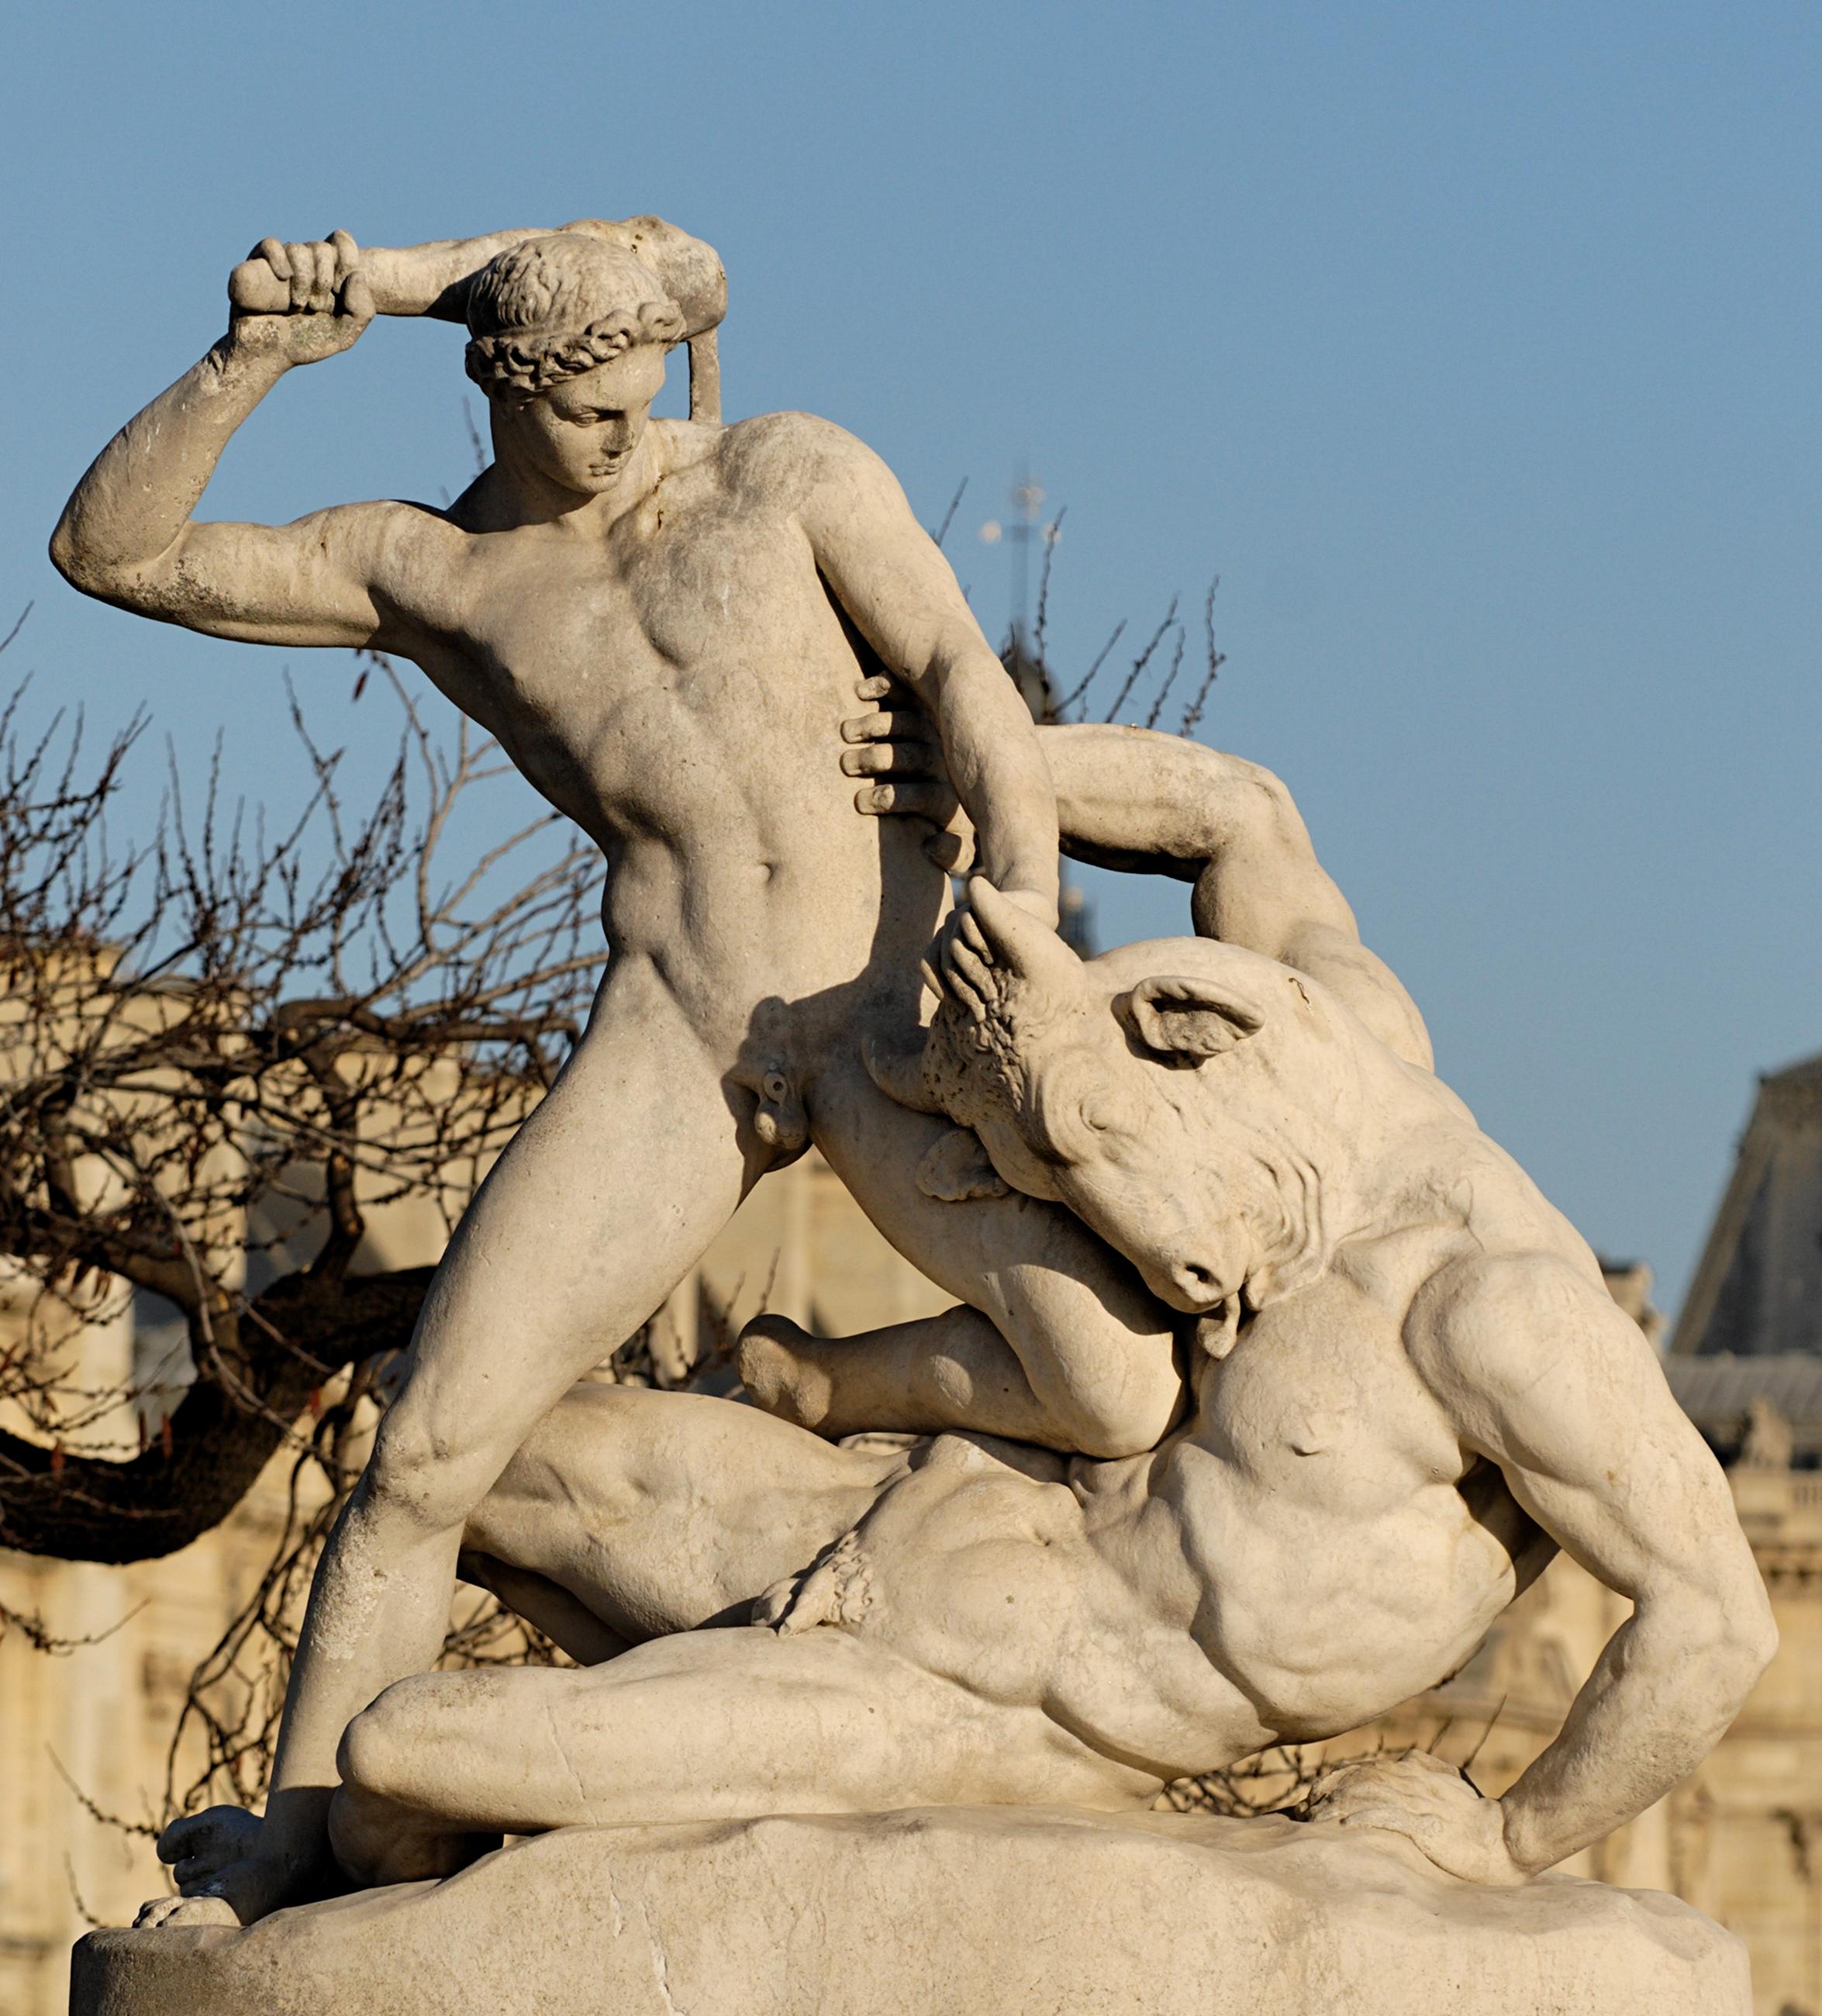 https://i1.wp.com/upload.wikimedia.org/wikipedia/commons/9/9b/Theseus_Minotaur_Ramey_Tuileries.jpg